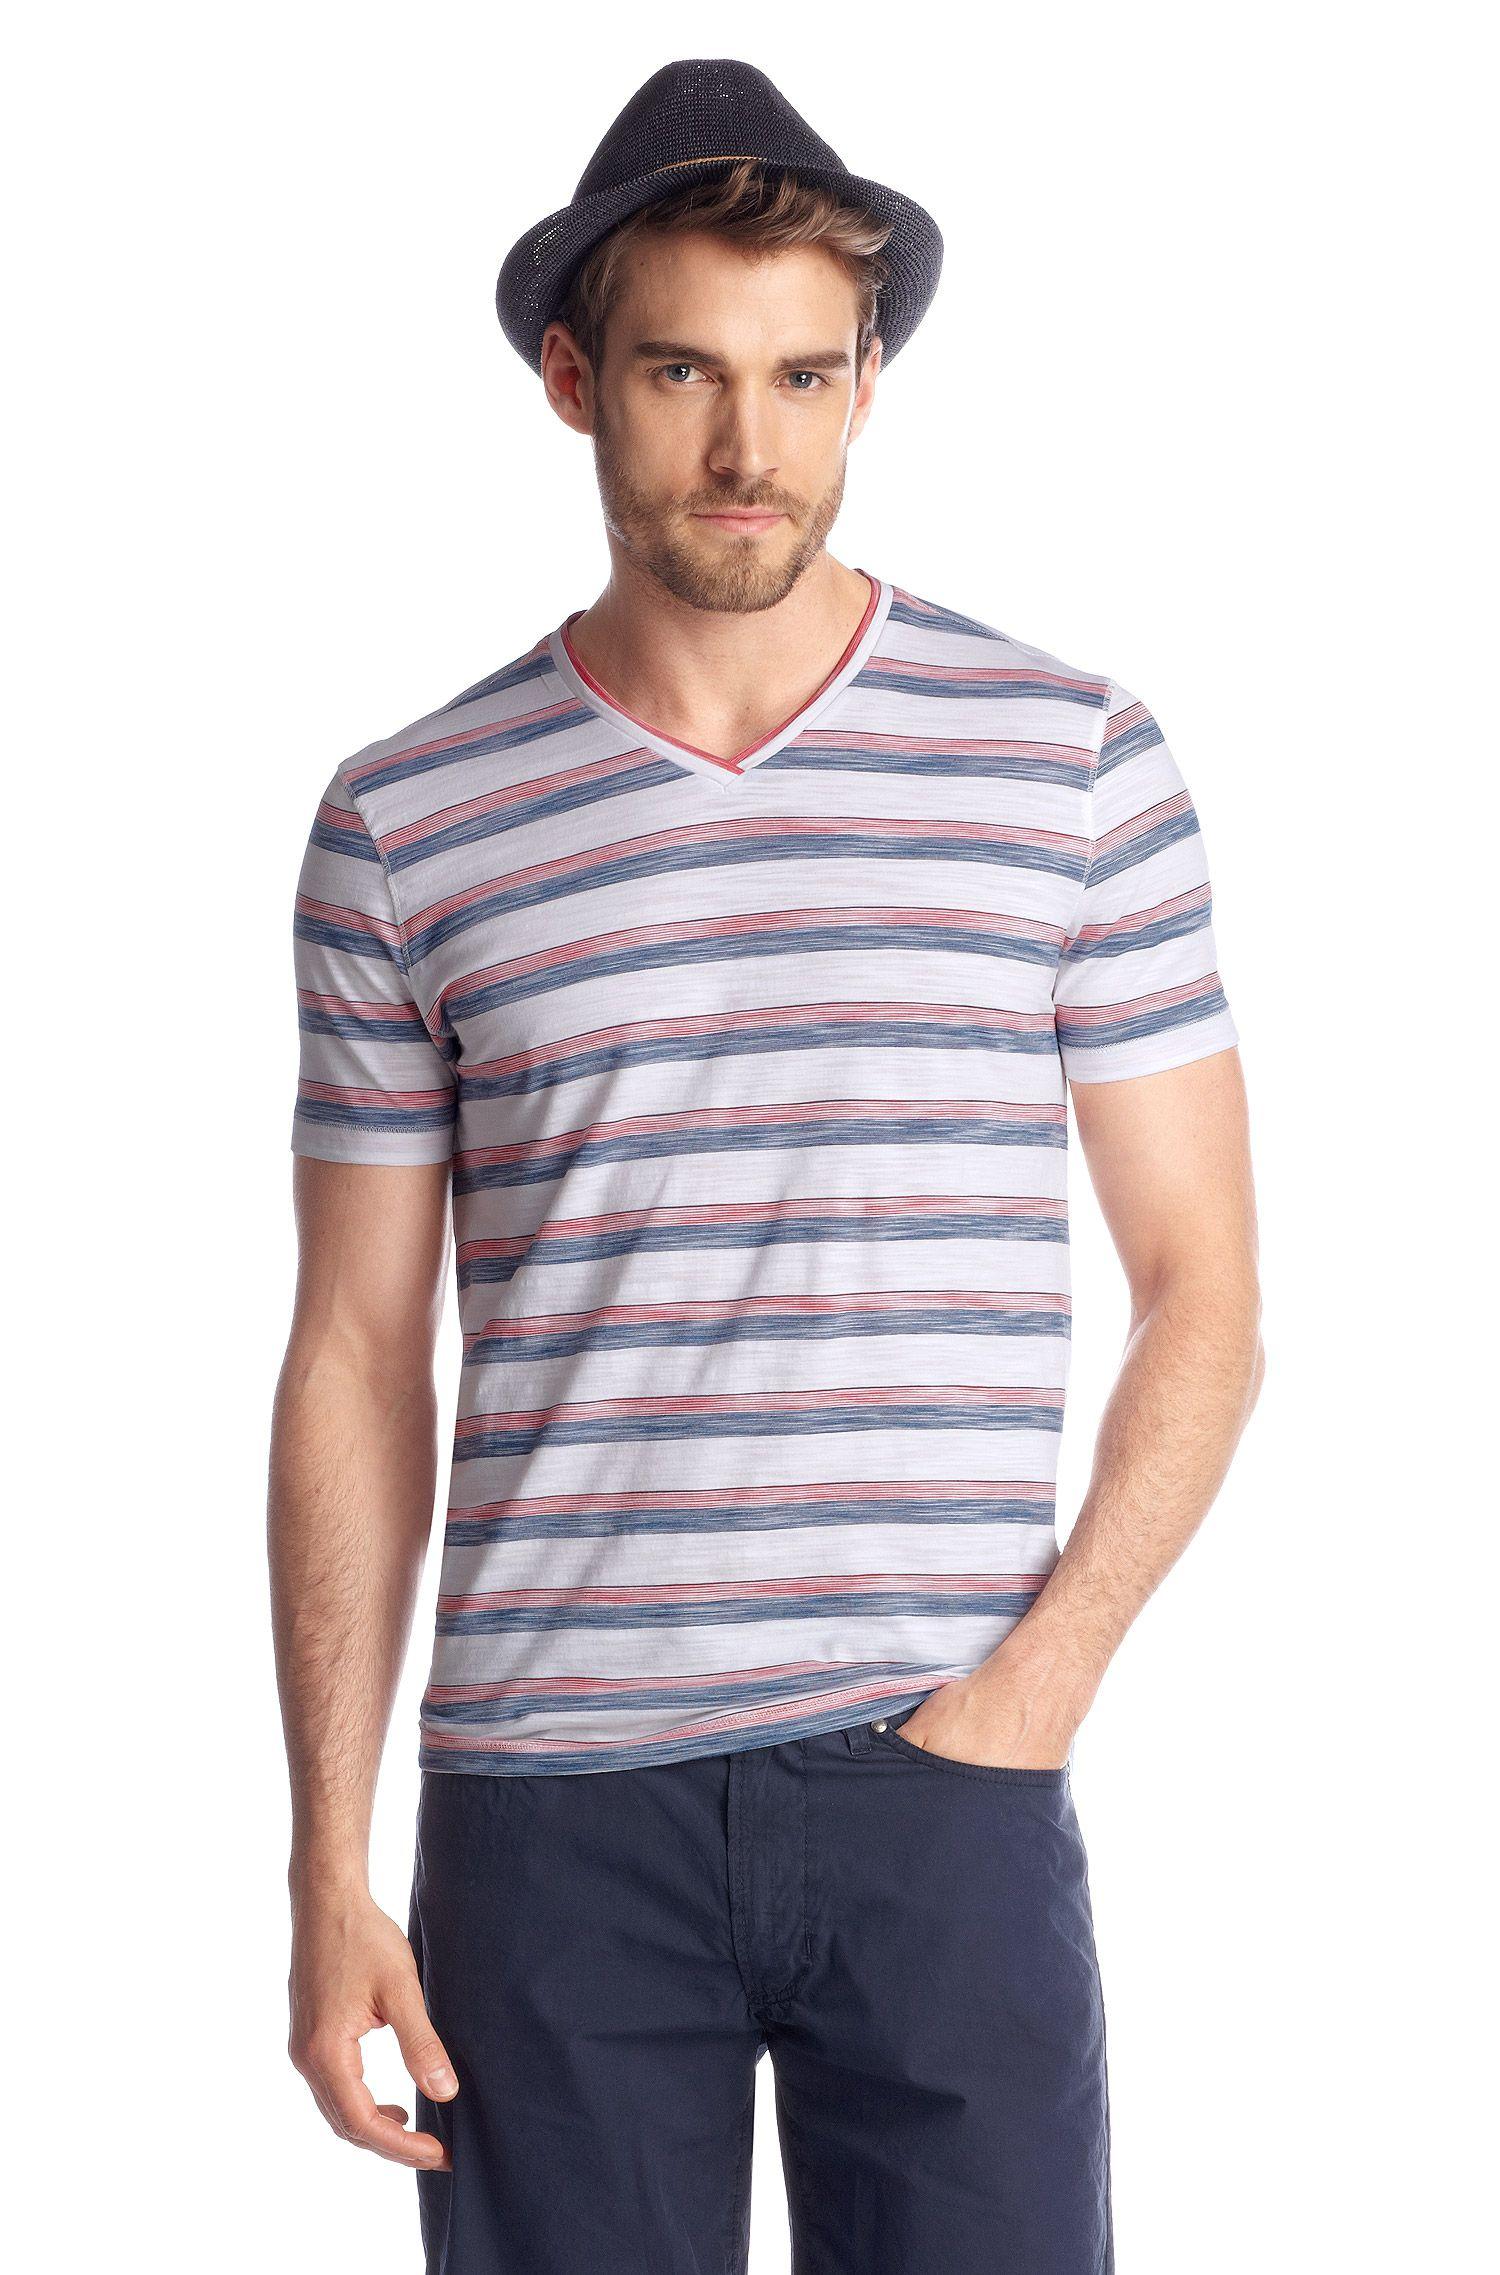 T-Shirt ´Eraldo 54` mit V-Ausschnitt